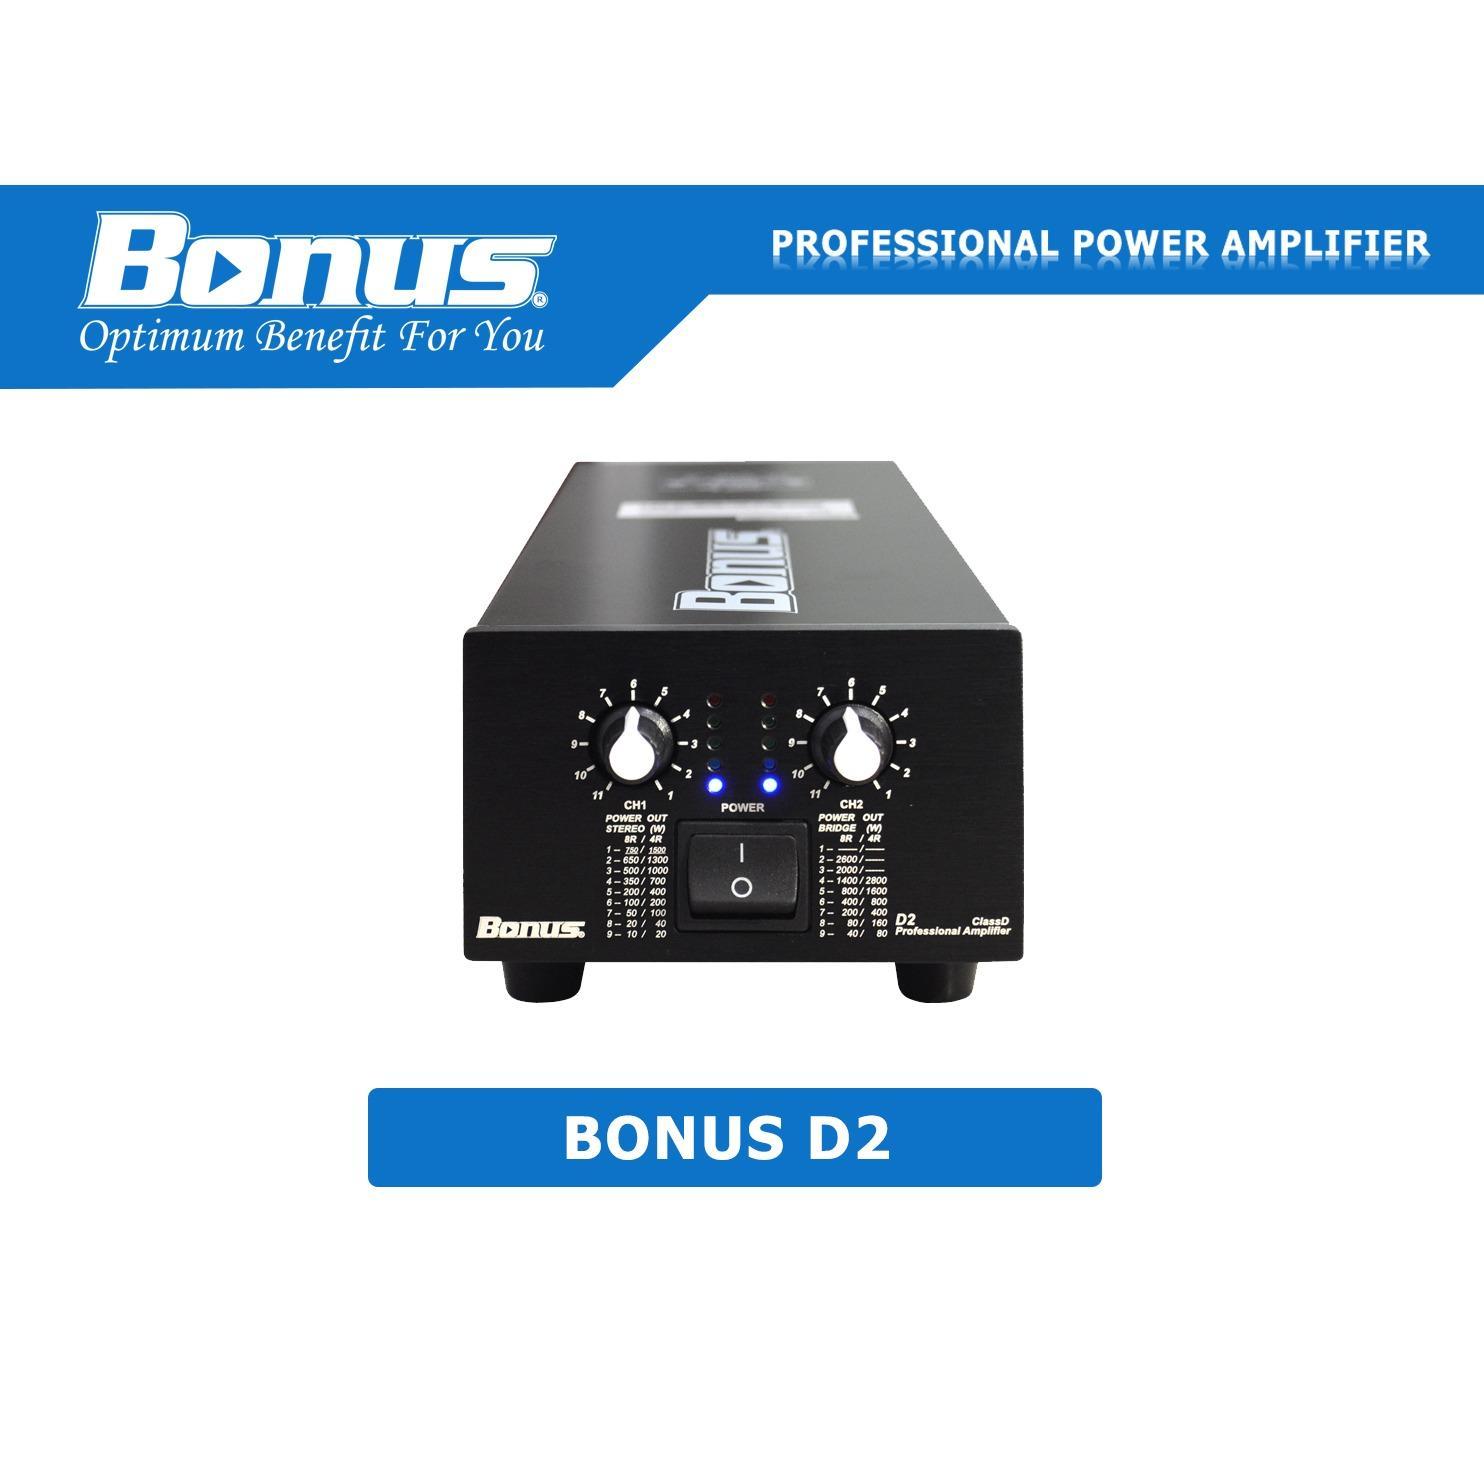 Ôn Tập Cục Đẩy Power Amplifier Bonus Audio D2 Hồ Chí Minh